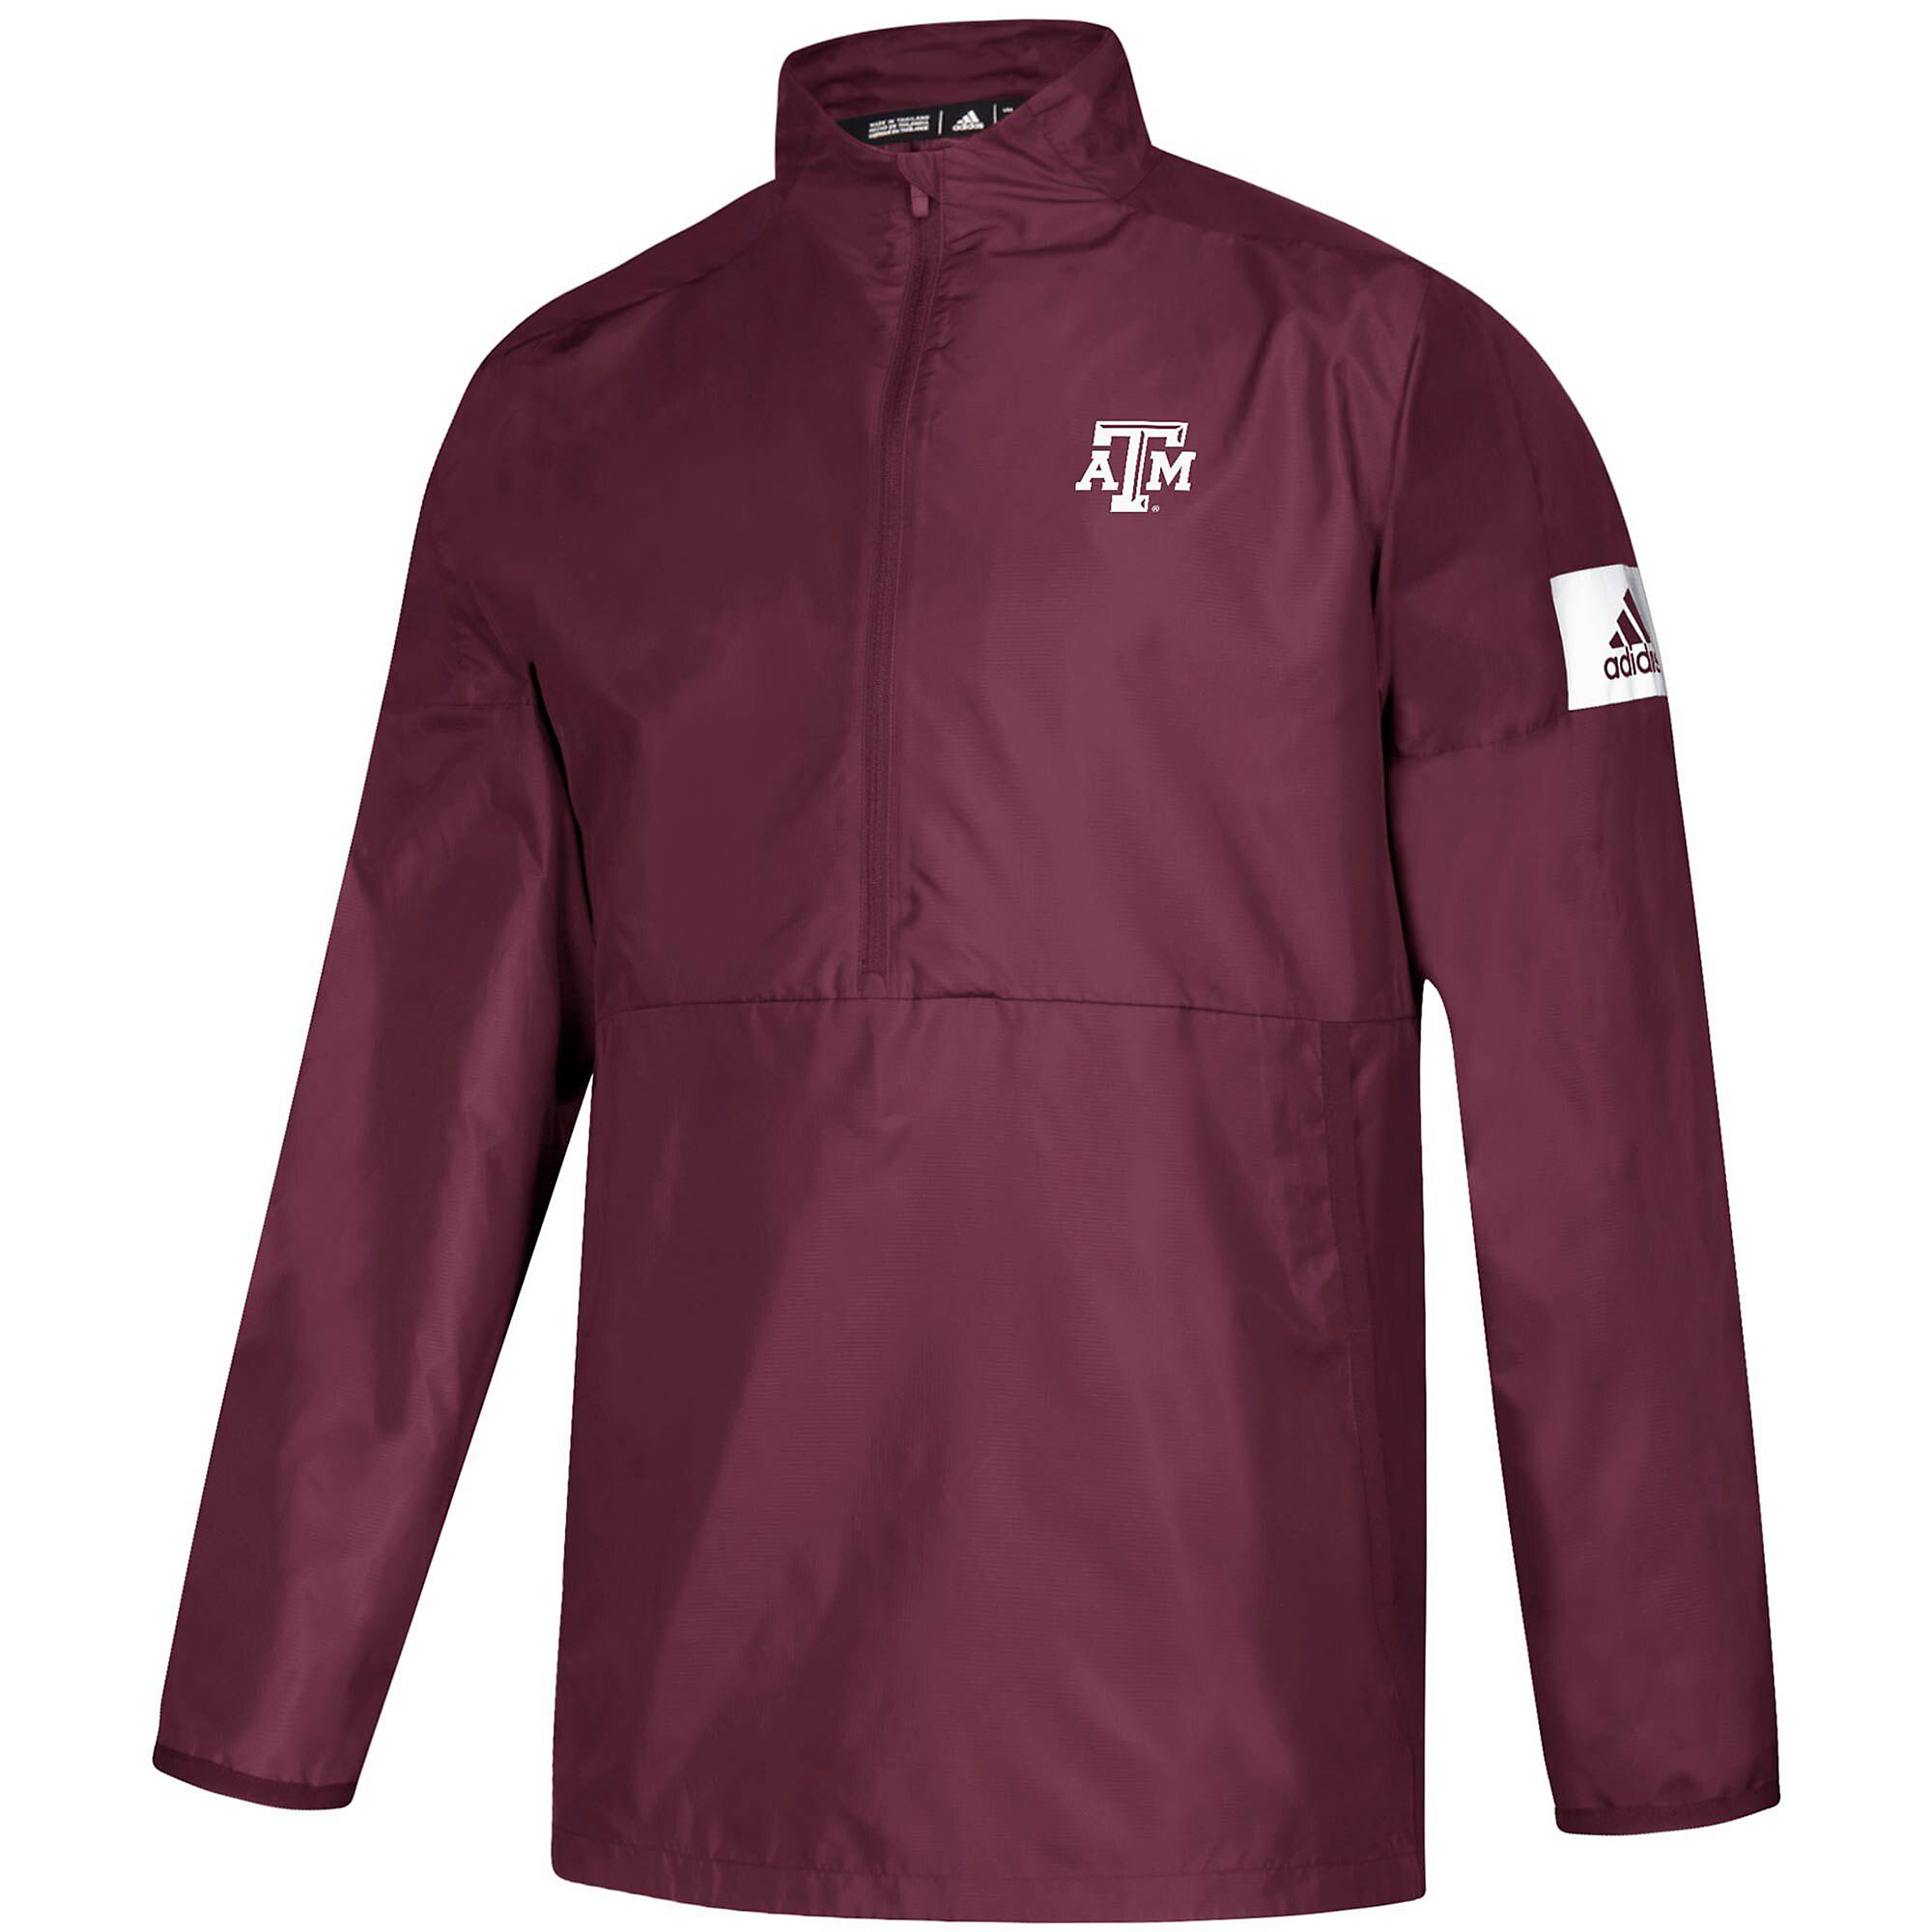 Texas A&M Aggies adidas Mens Long Sleeve Woven 1/4 Zip Pullover